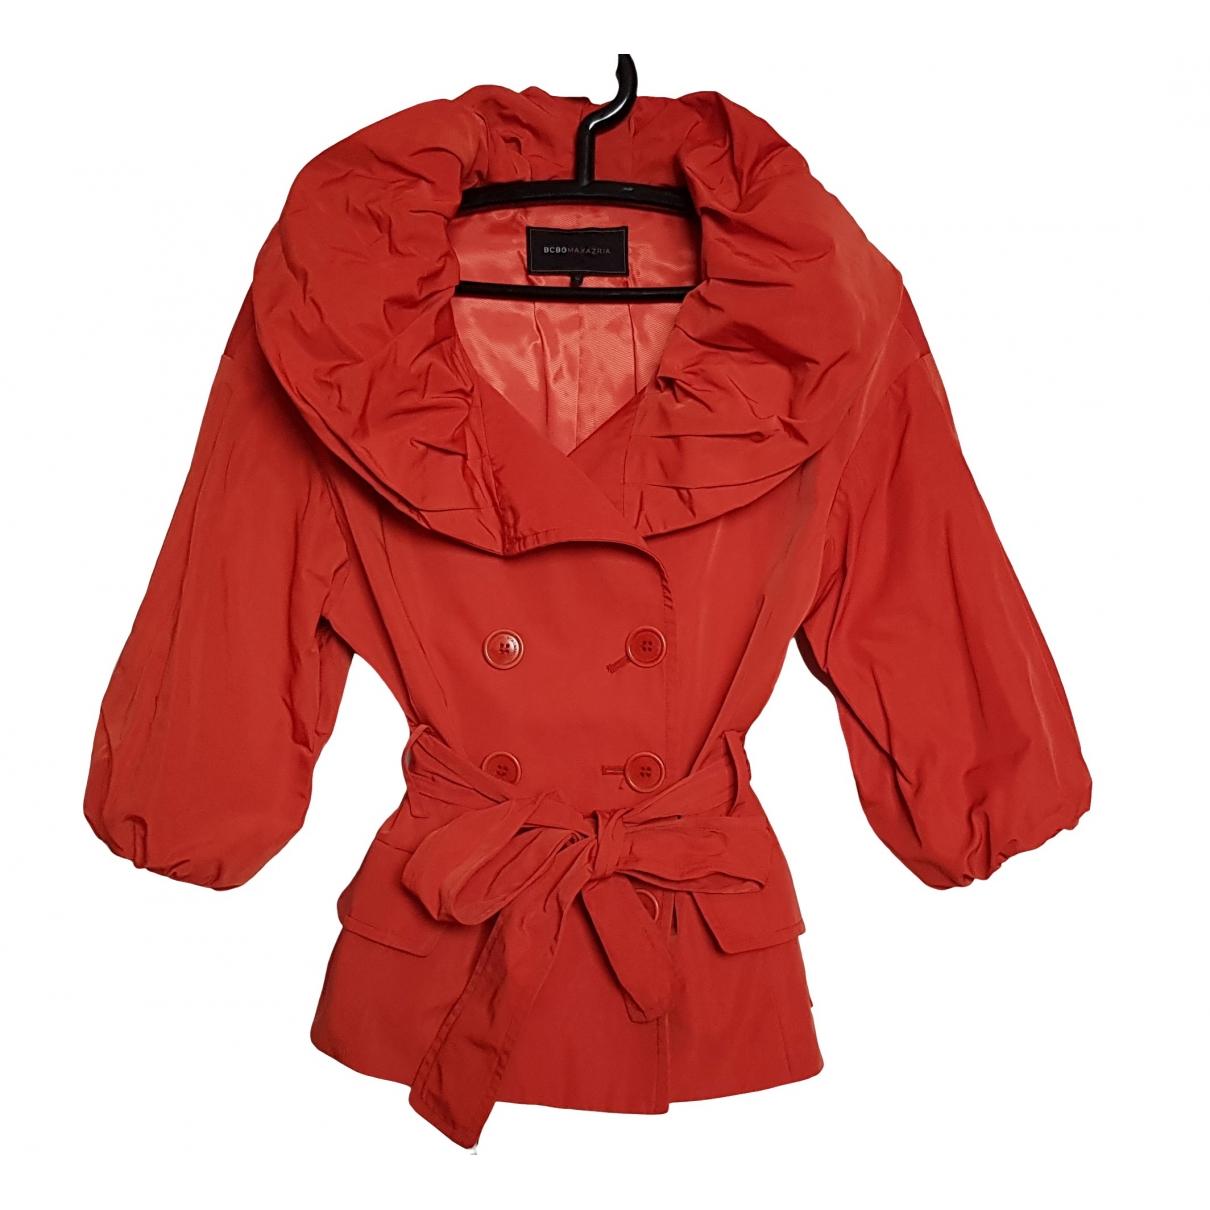 Bcbg Max Azria \N Orange jacket for Women M International